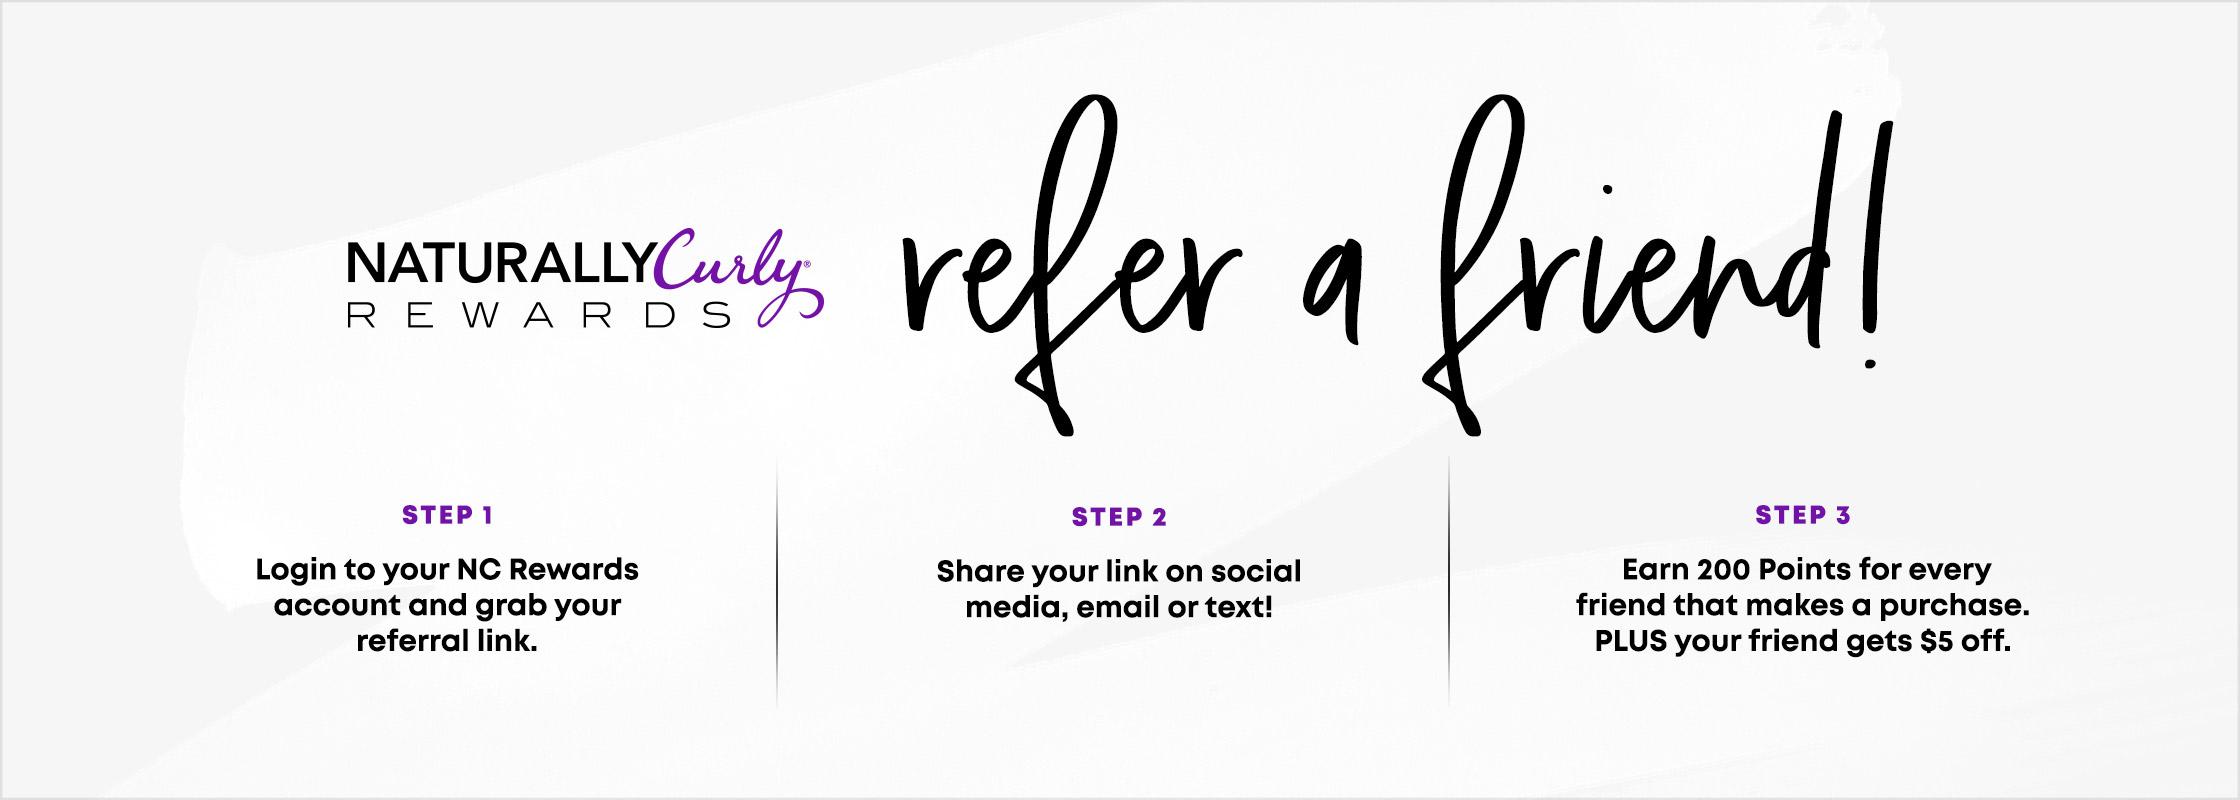 https://shop.naturallycurly.com/product_images/uploaded_images/rewards-referral-mobile.jpg